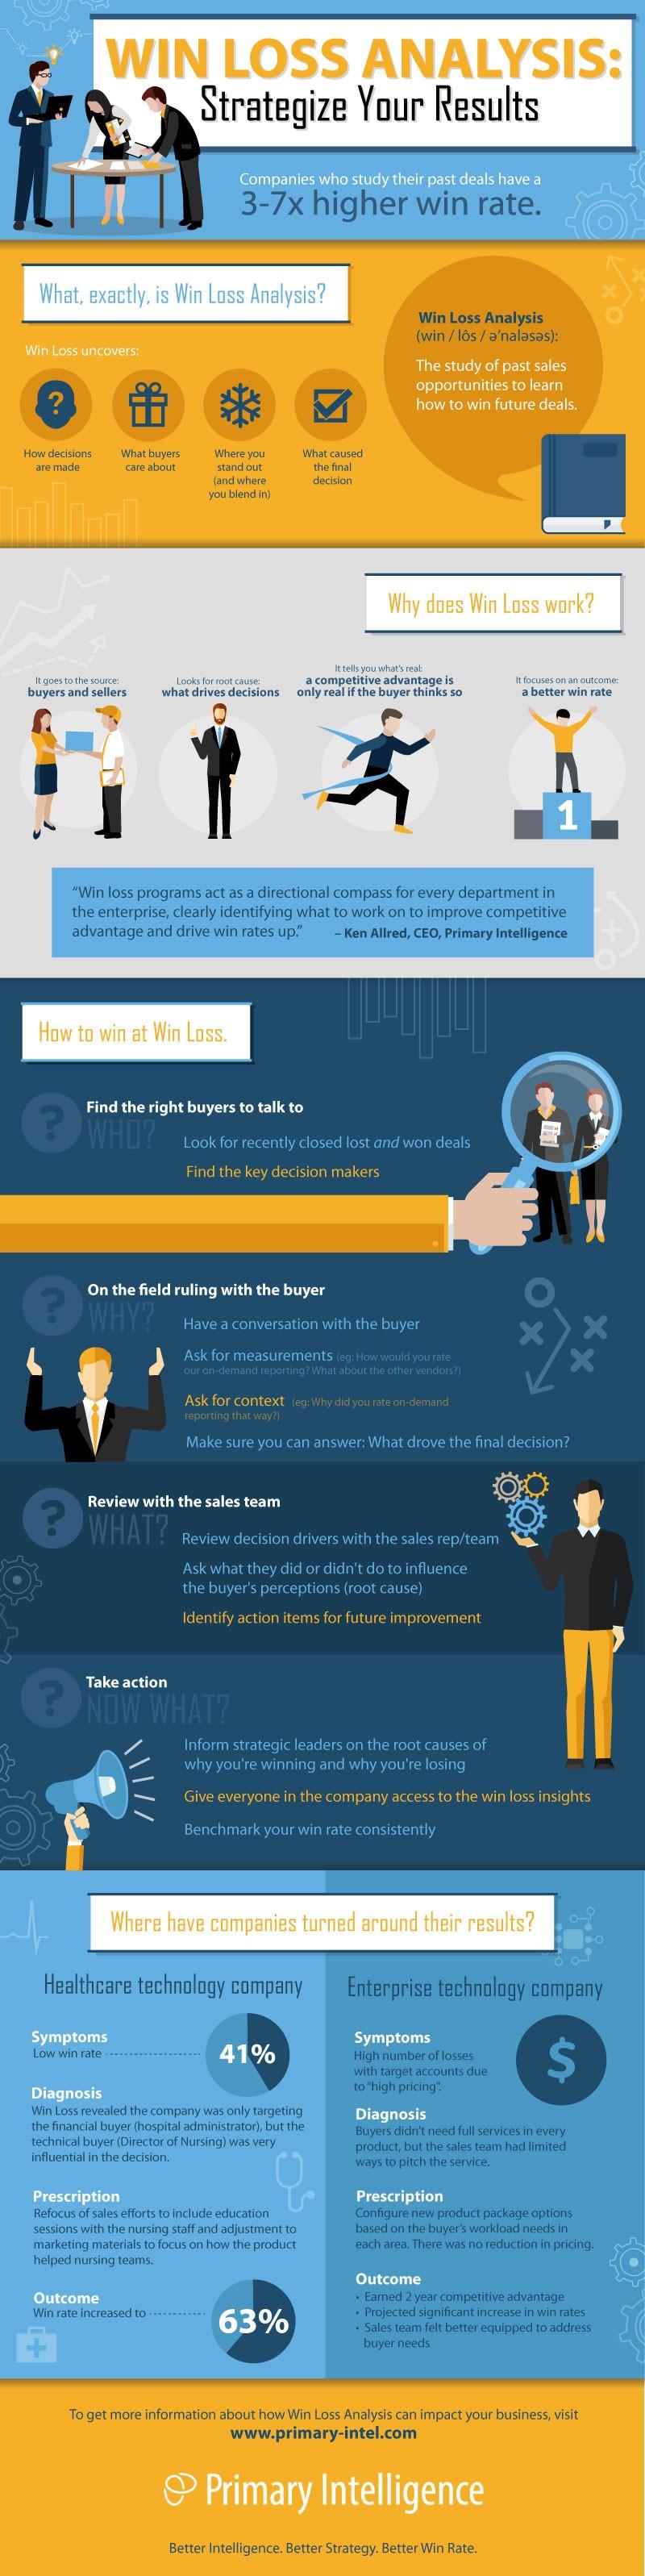 Win Loss Analysis Infographic